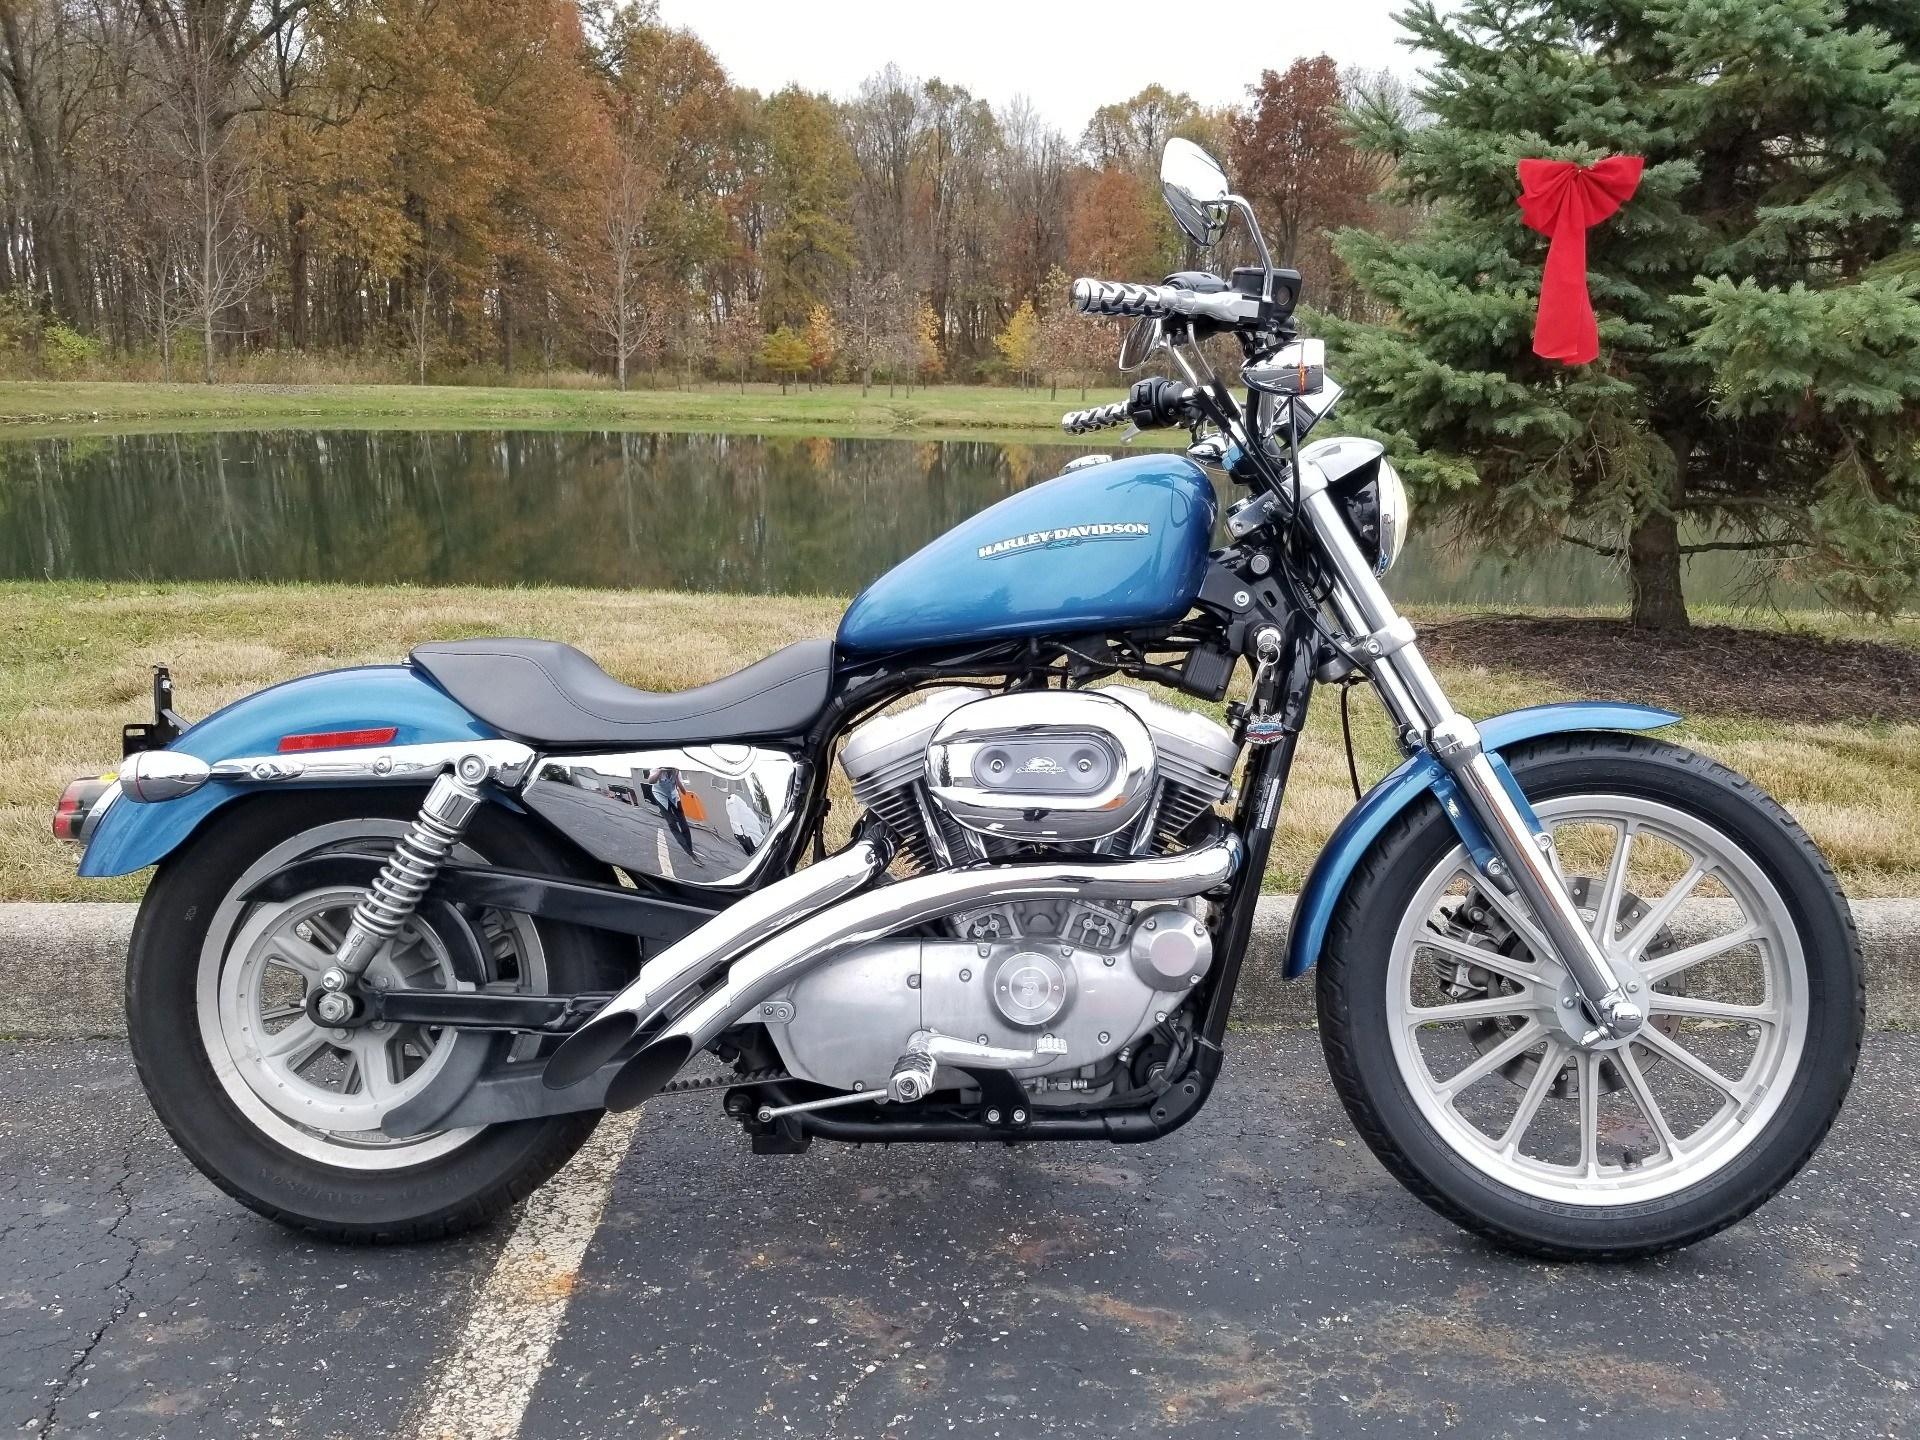 2005 Harley Davidson >> 2005 Harley Davidson Sportster Xl 883l In Sunbury Ohio